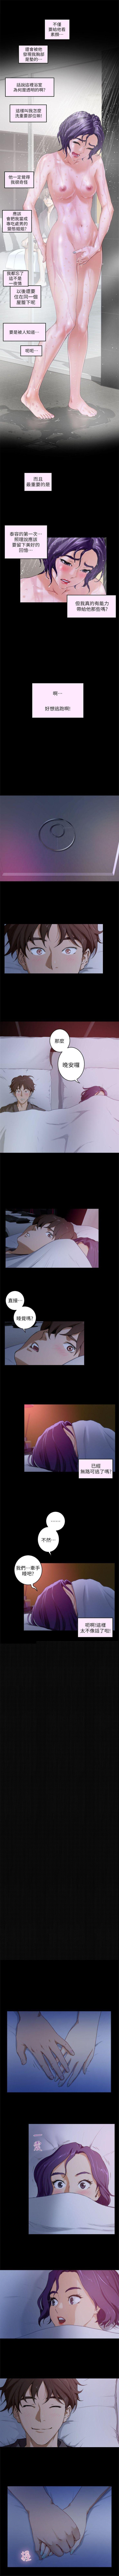 S-Mate 1-10 中文翻译(更新中) 25